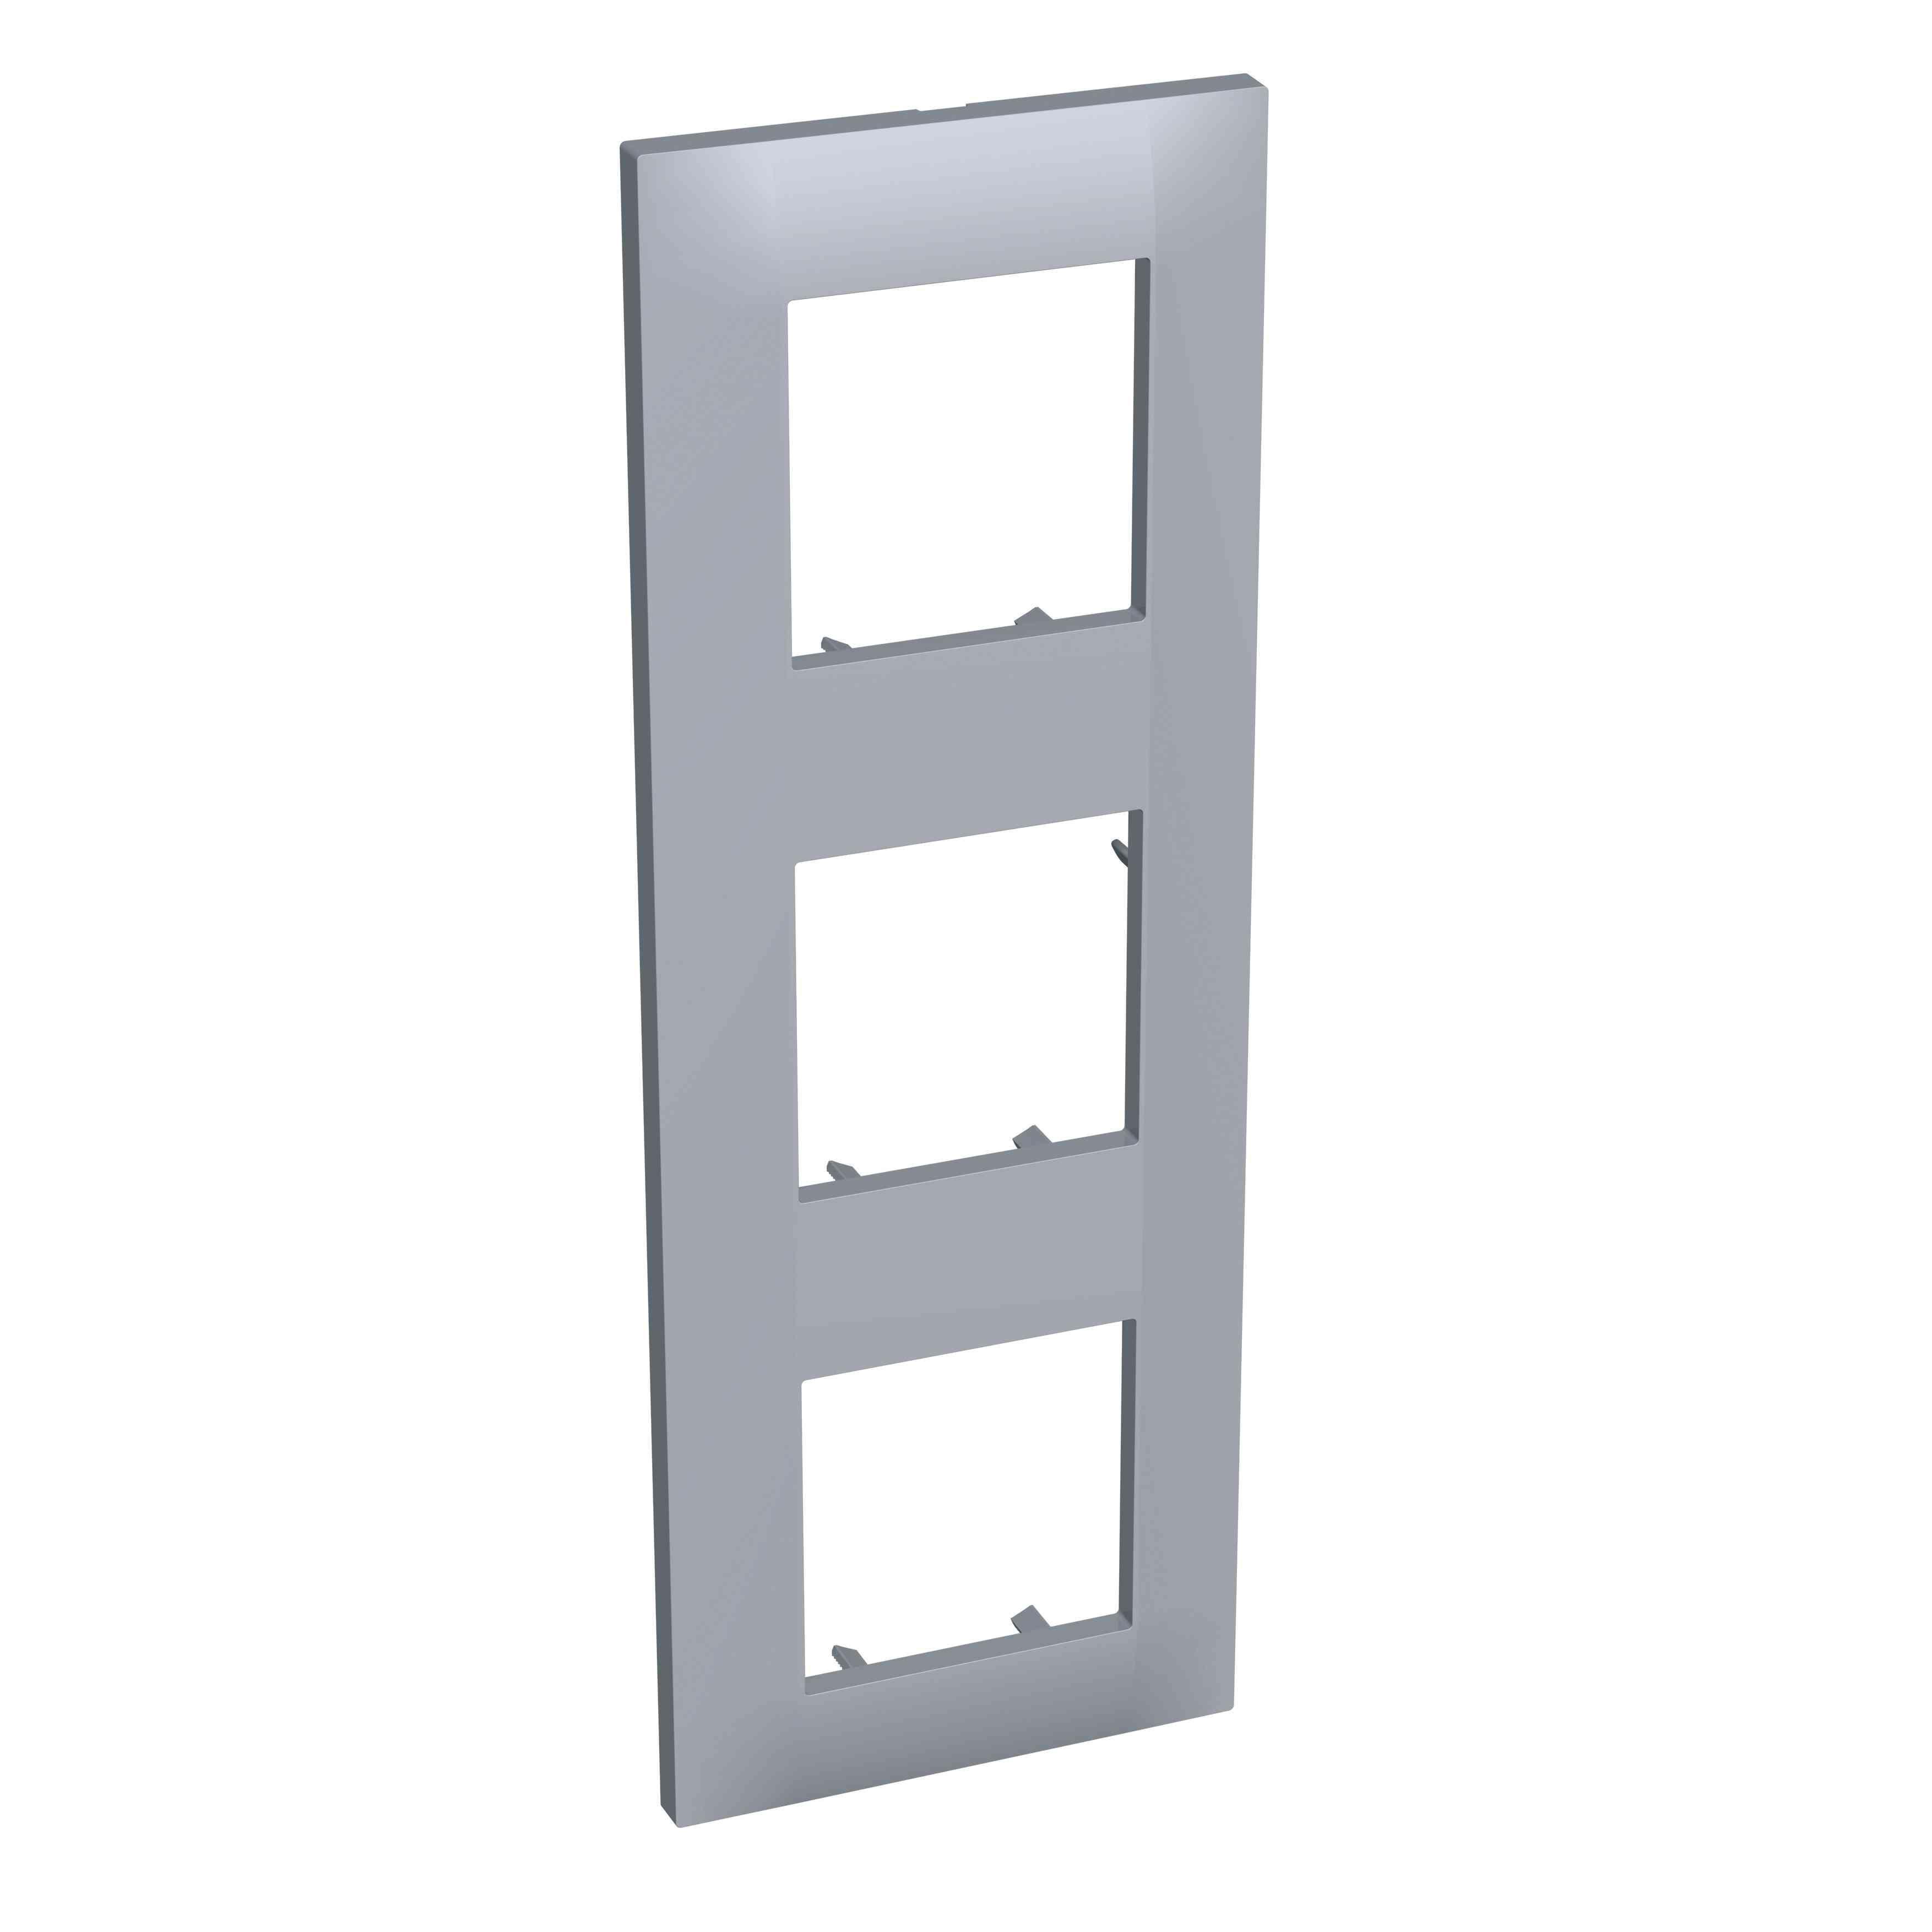 Altira - dekorativni okvir - 3 odprtine navpično - megleno siv - 71 mm